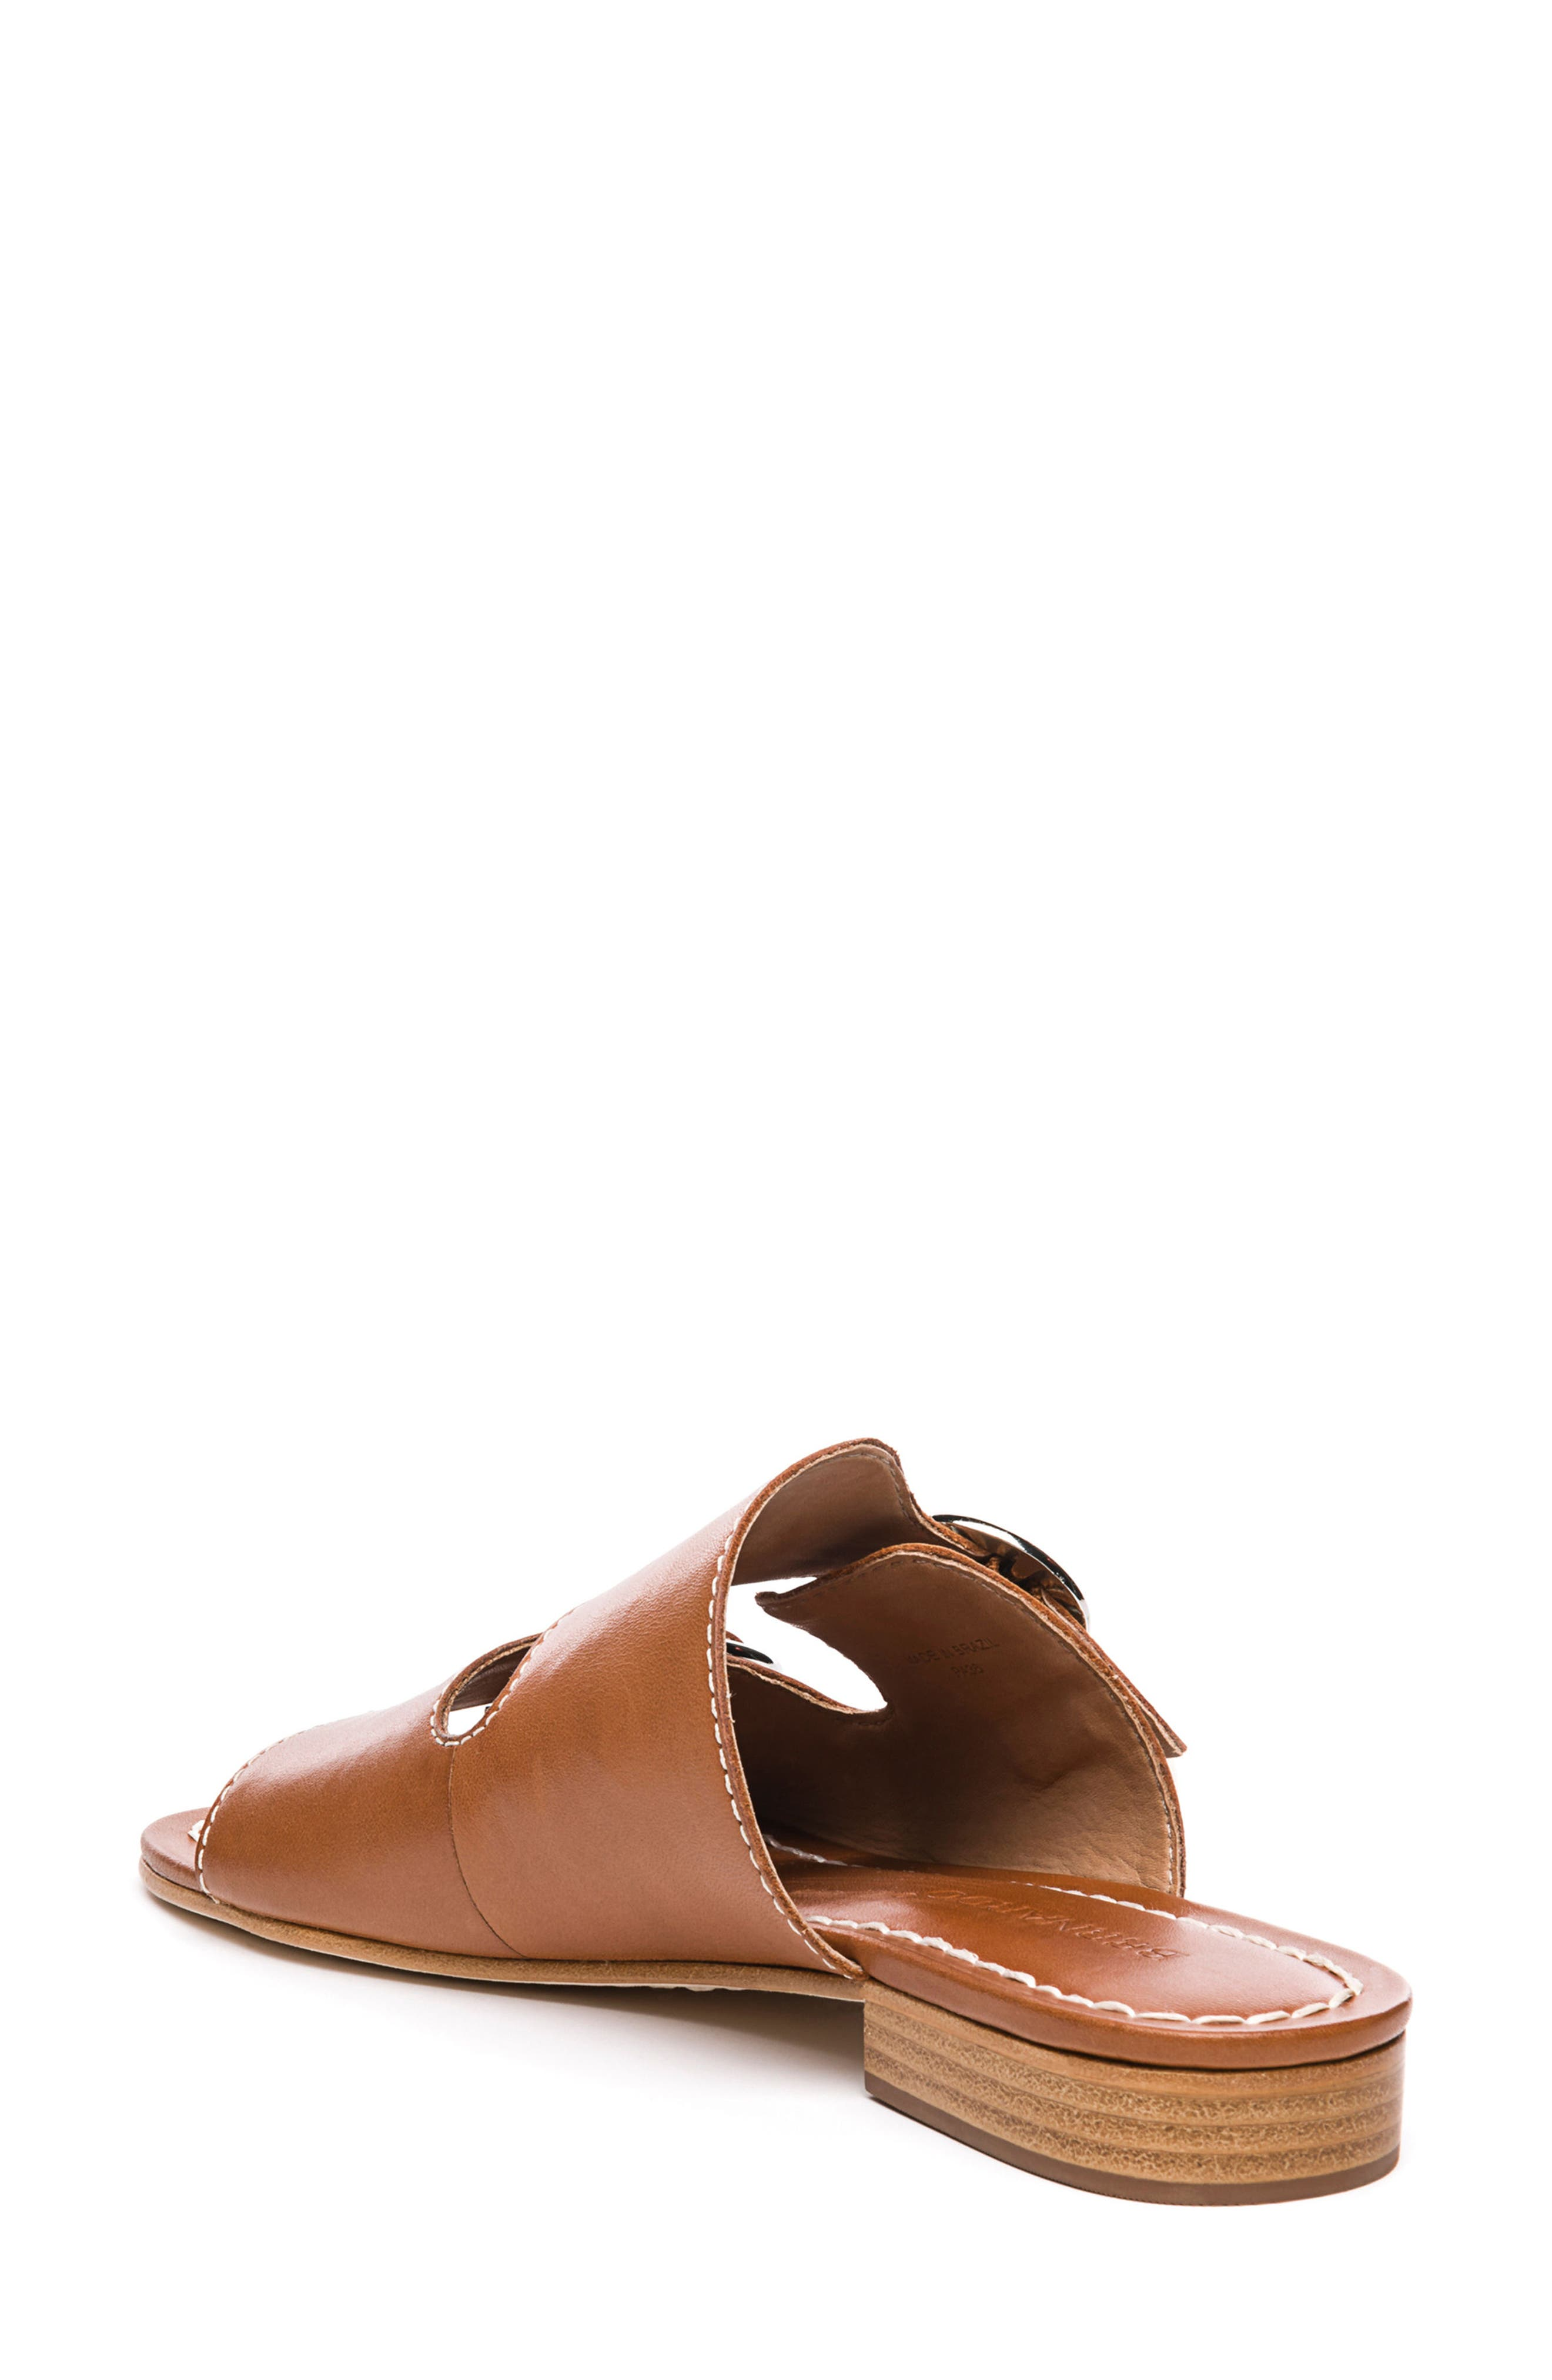 Bernardo Tobi Slide Sandal,                             Alternate thumbnail 2, color,                             Luggage Leather